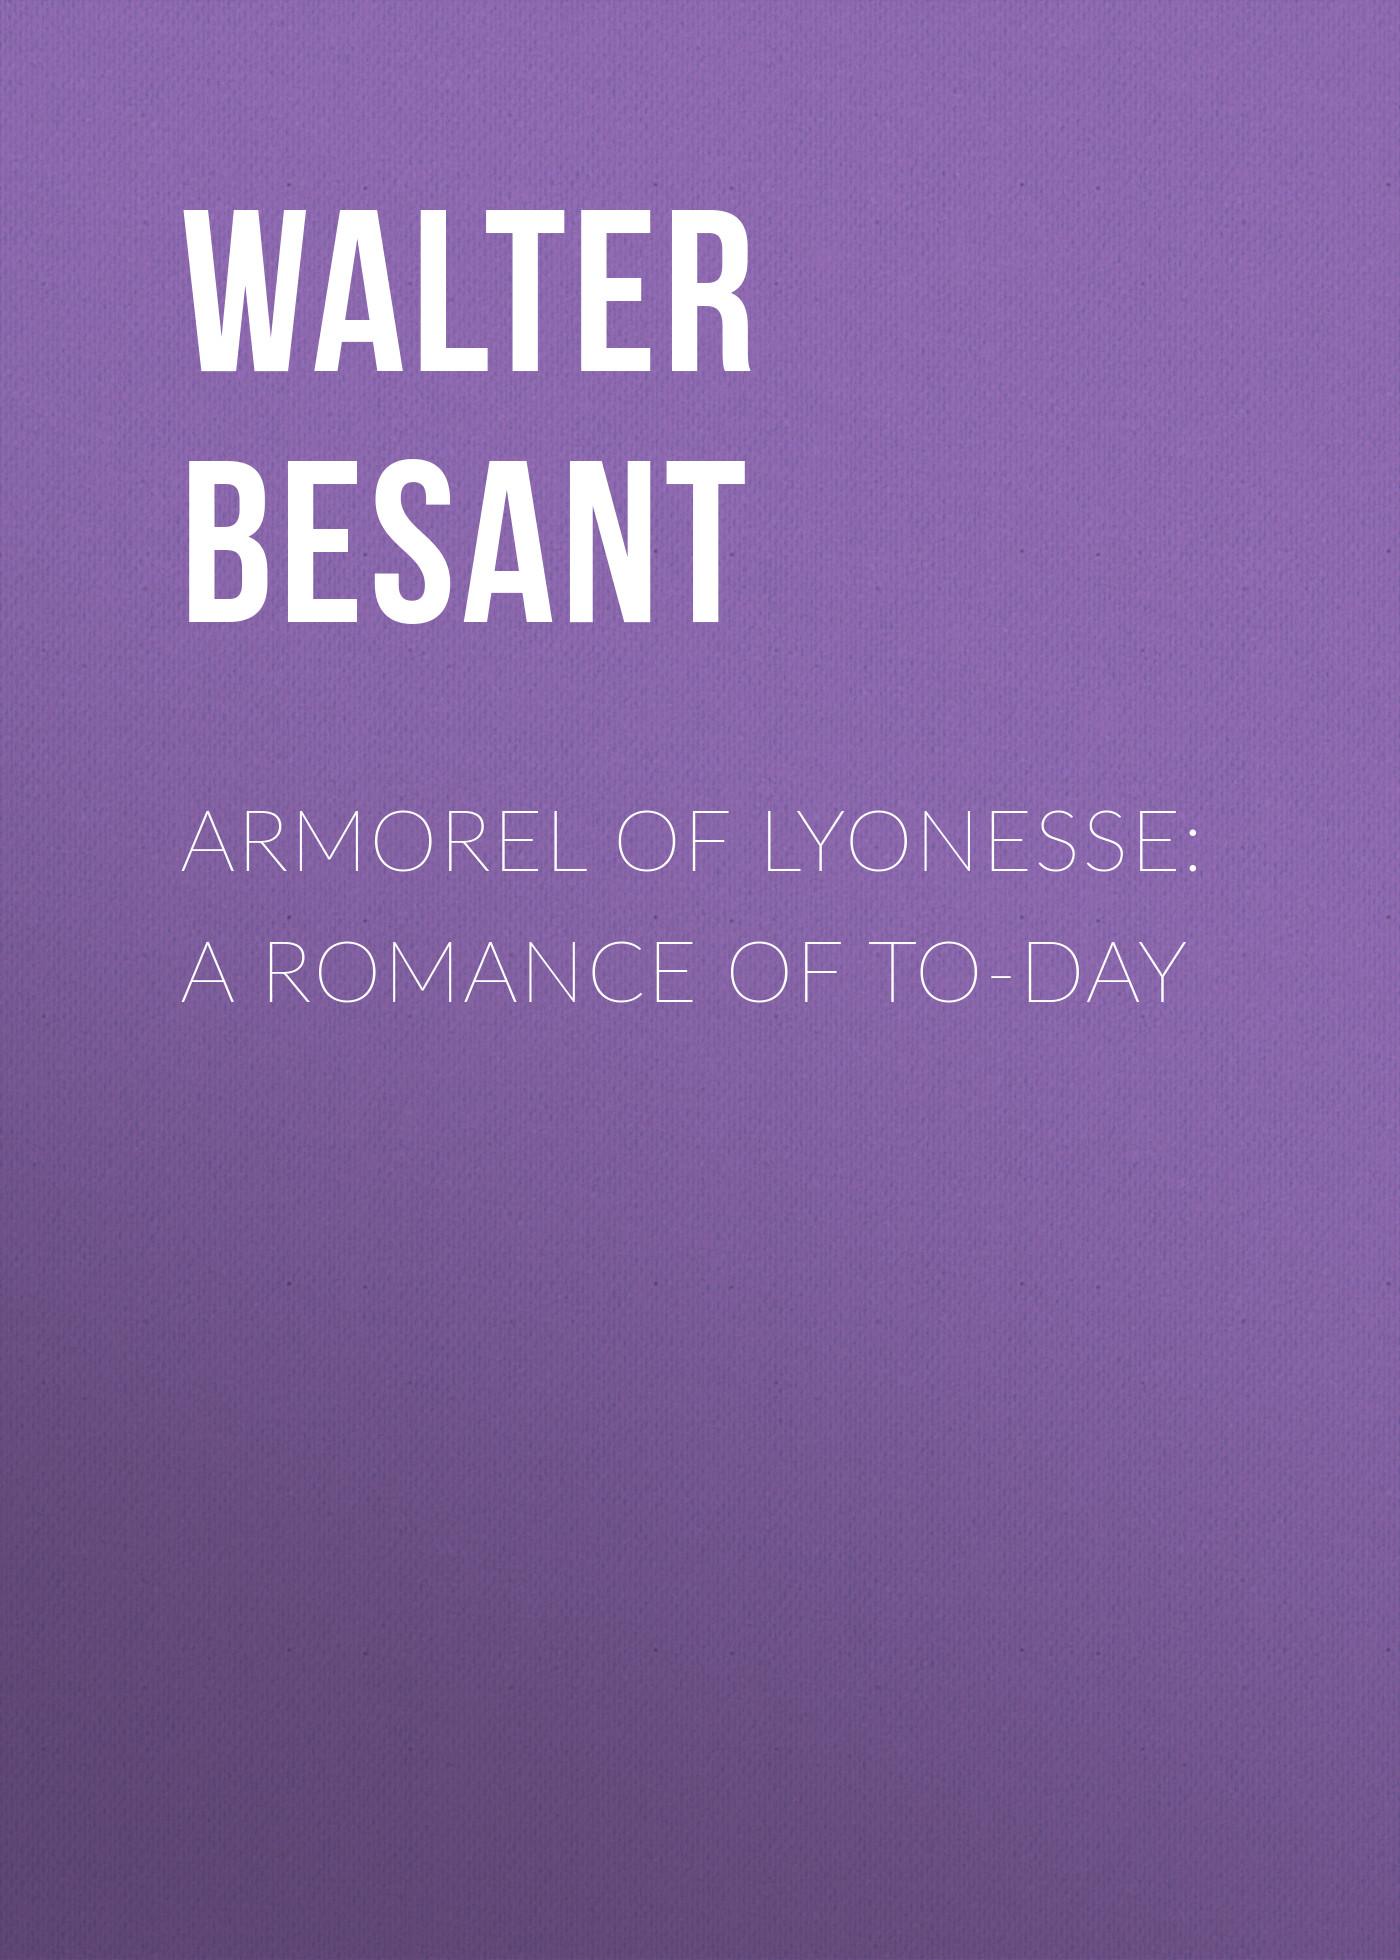 все цены на Walter Besant Armorel of Lyonesse: A Romance of To-day онлайн